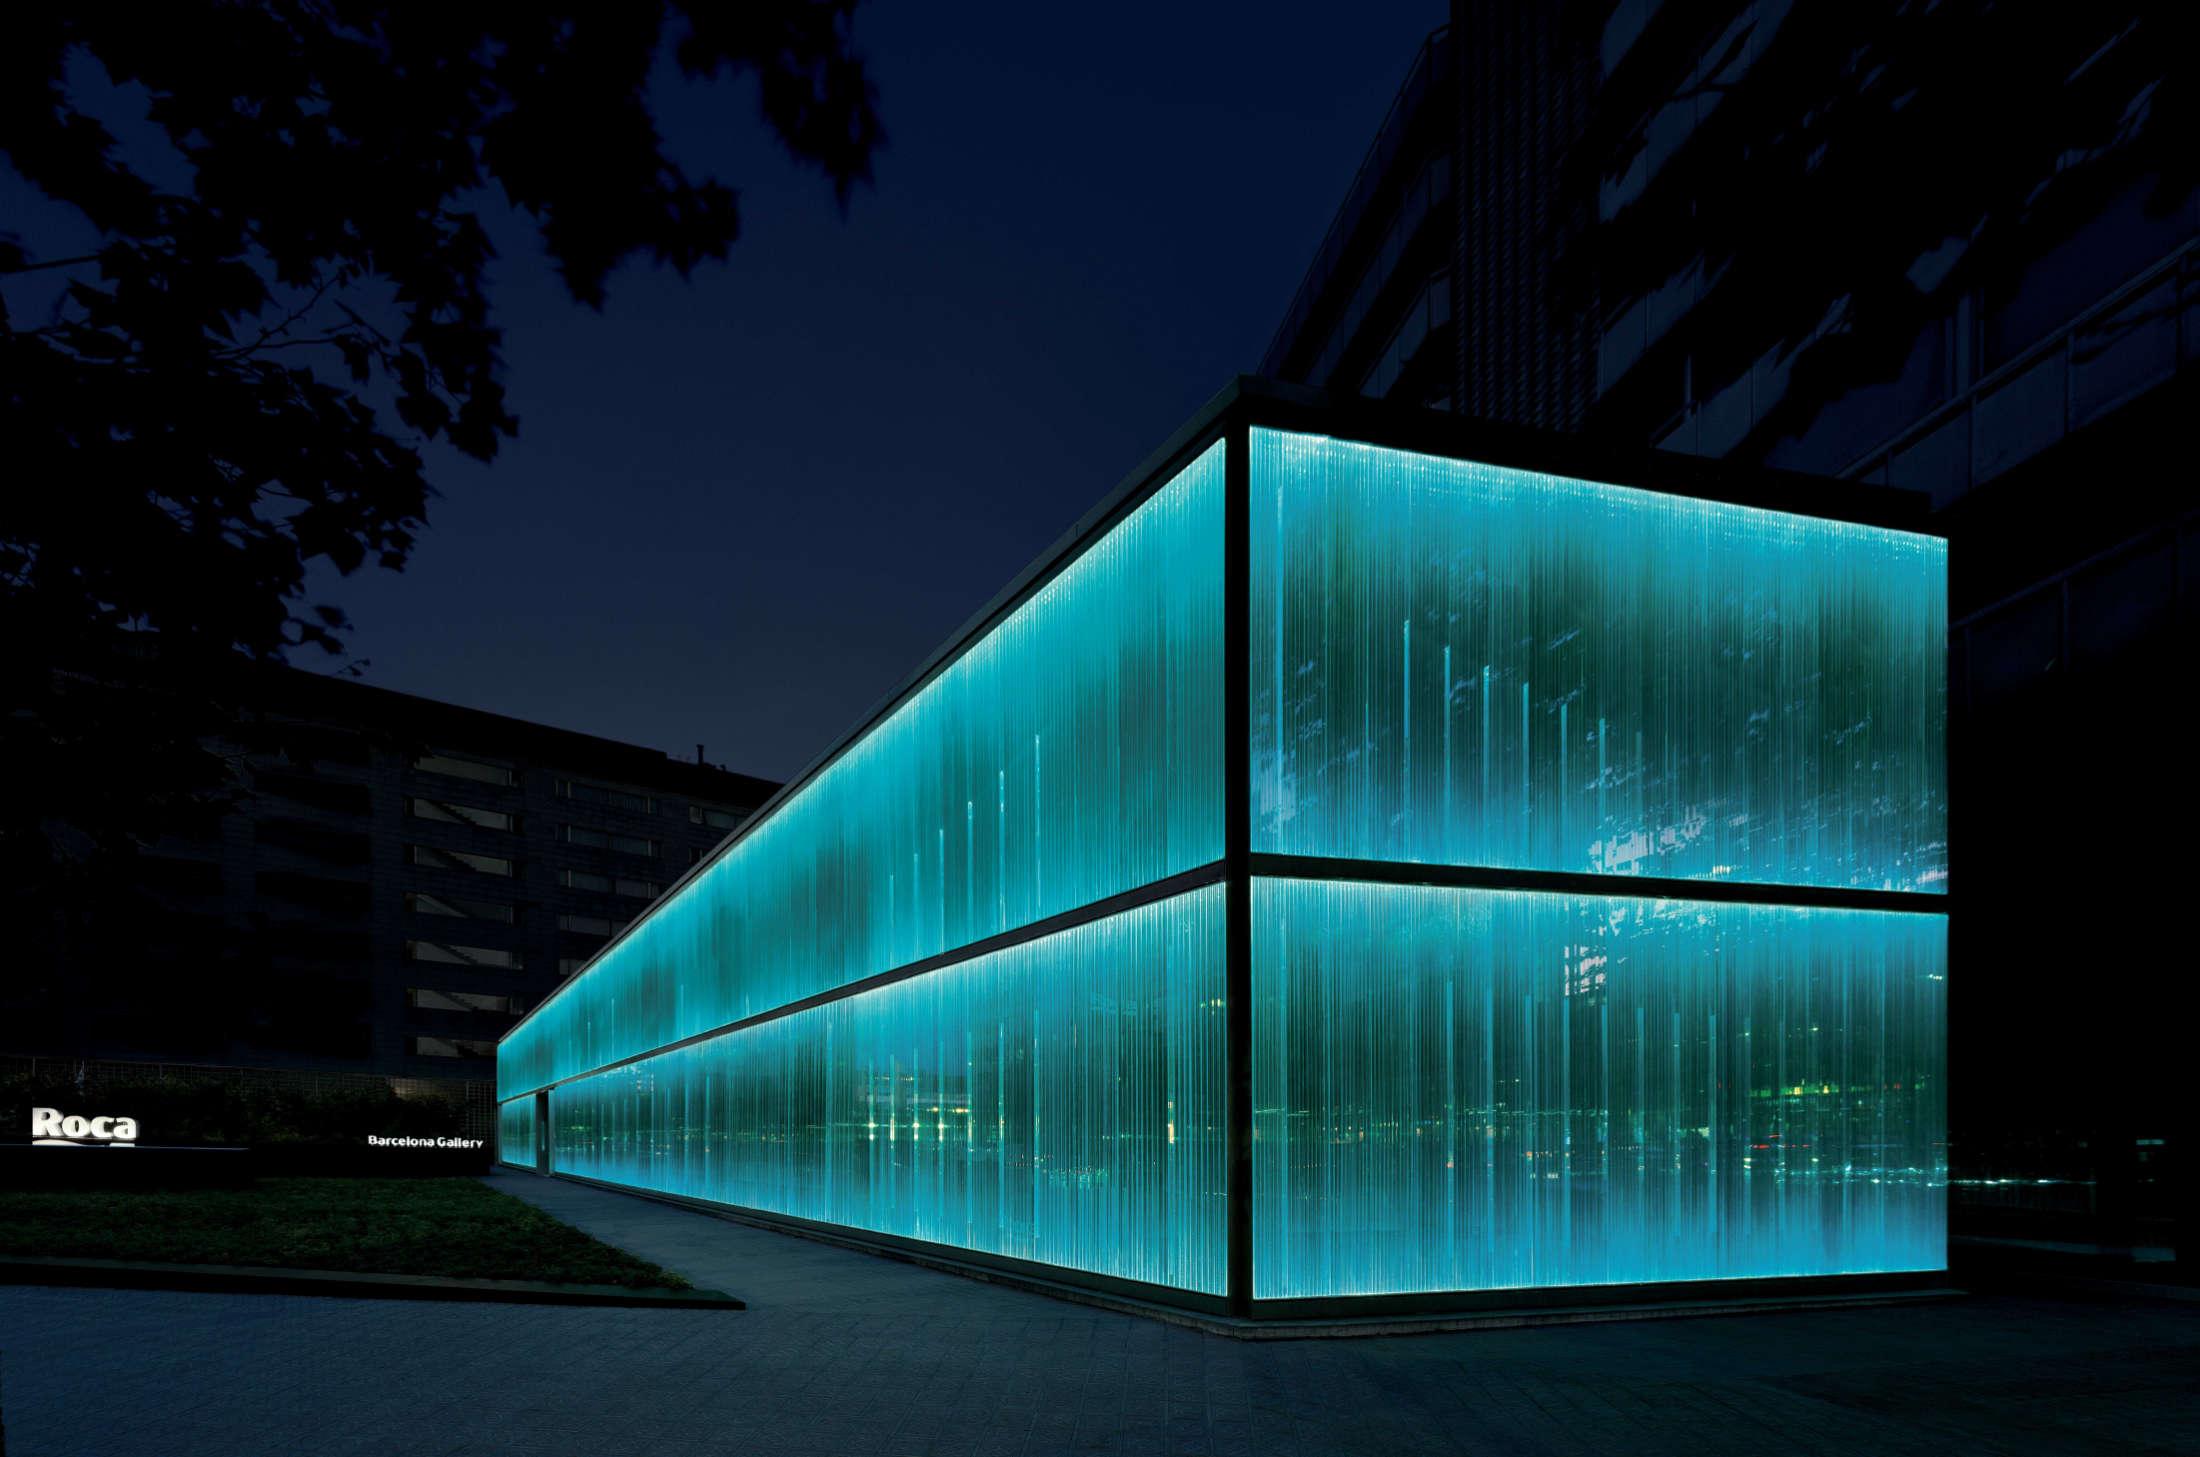 Roca Barcelona Gallery designed by Studio Carlos Ferrater - OAB Barcelona